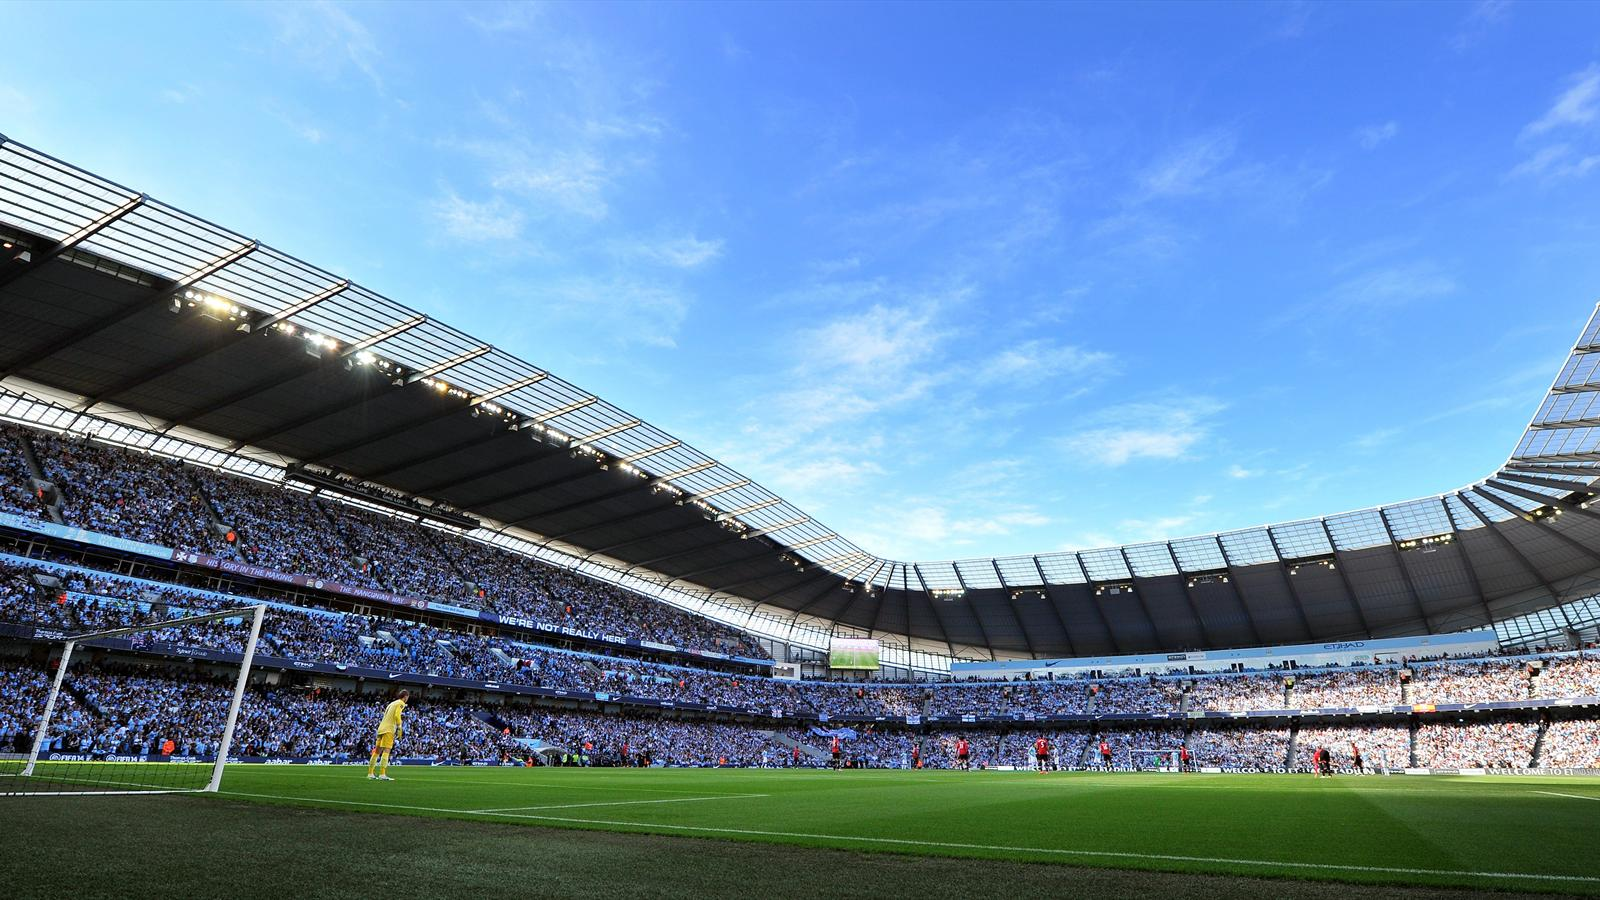 EN DIRECT / LIVE. Manchester City - FC Porto - Ligue des champions - 21 octobre 2020 - Eurosport